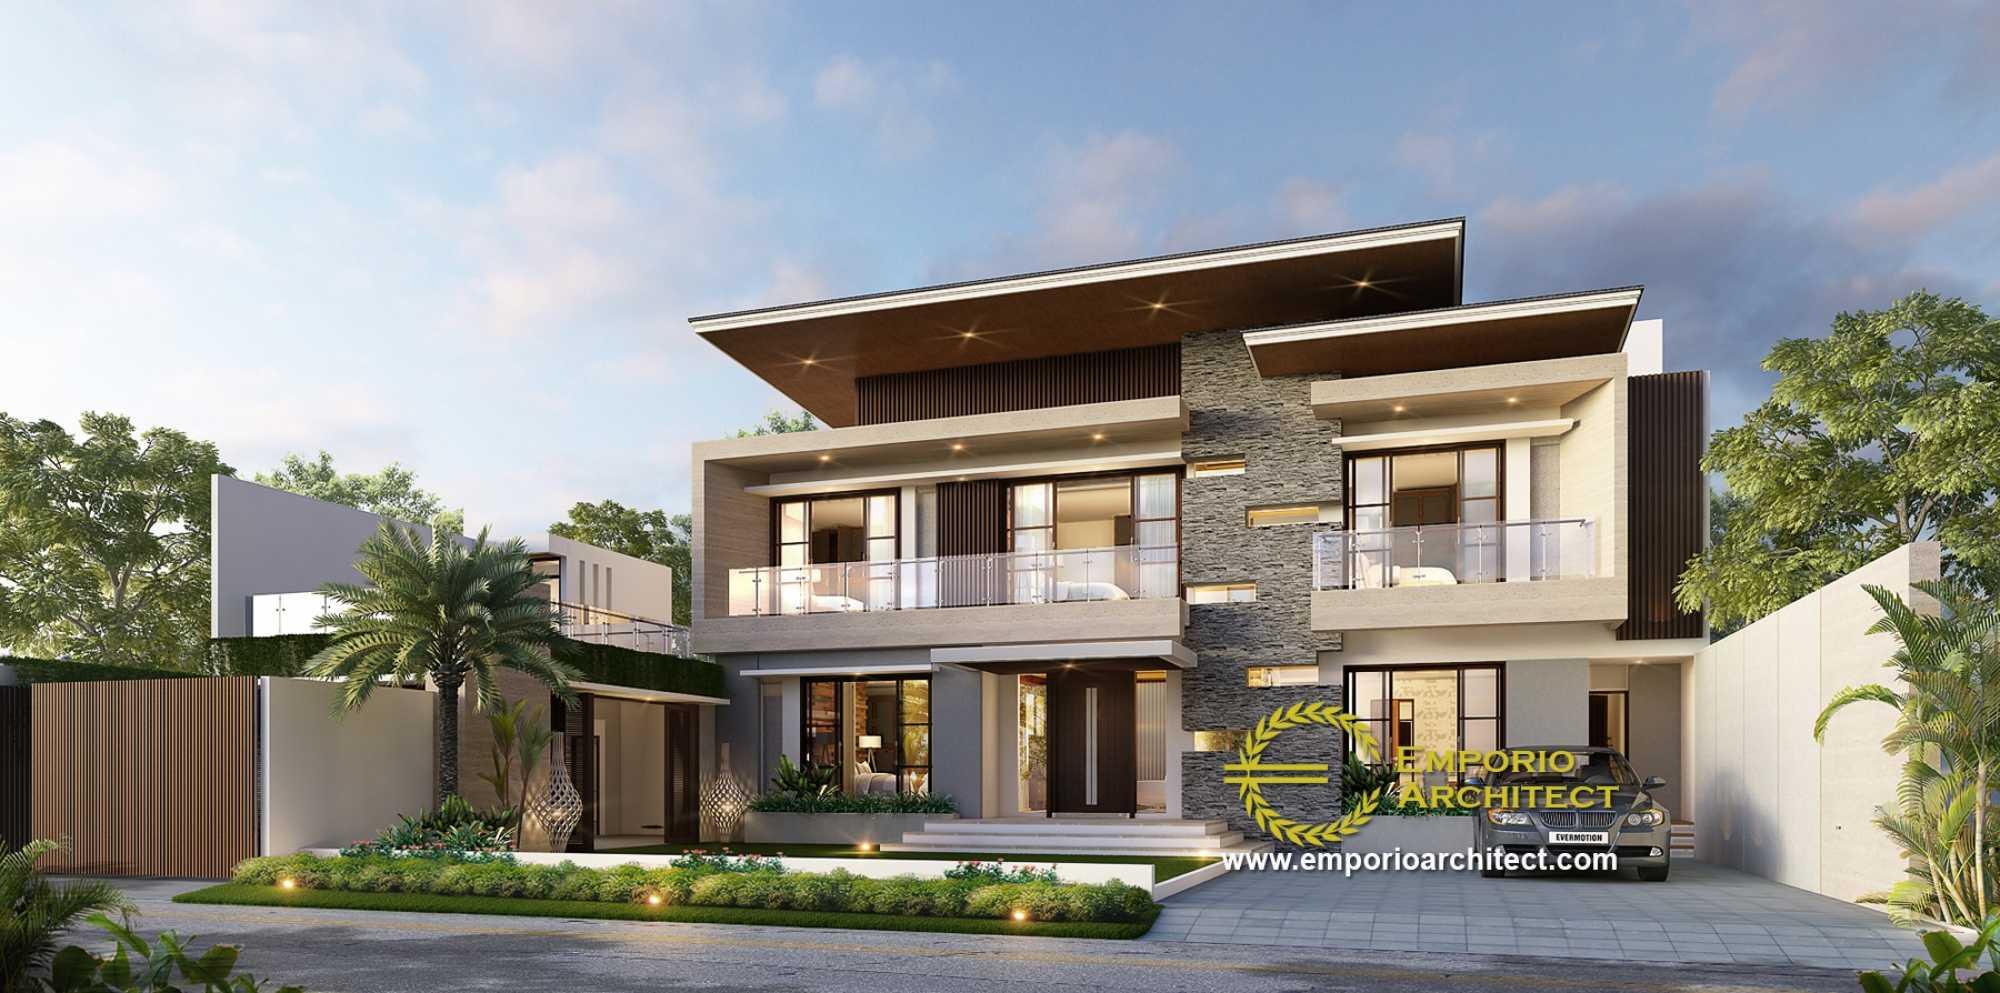 Emporio Architect di Nusa Tenggara Barat